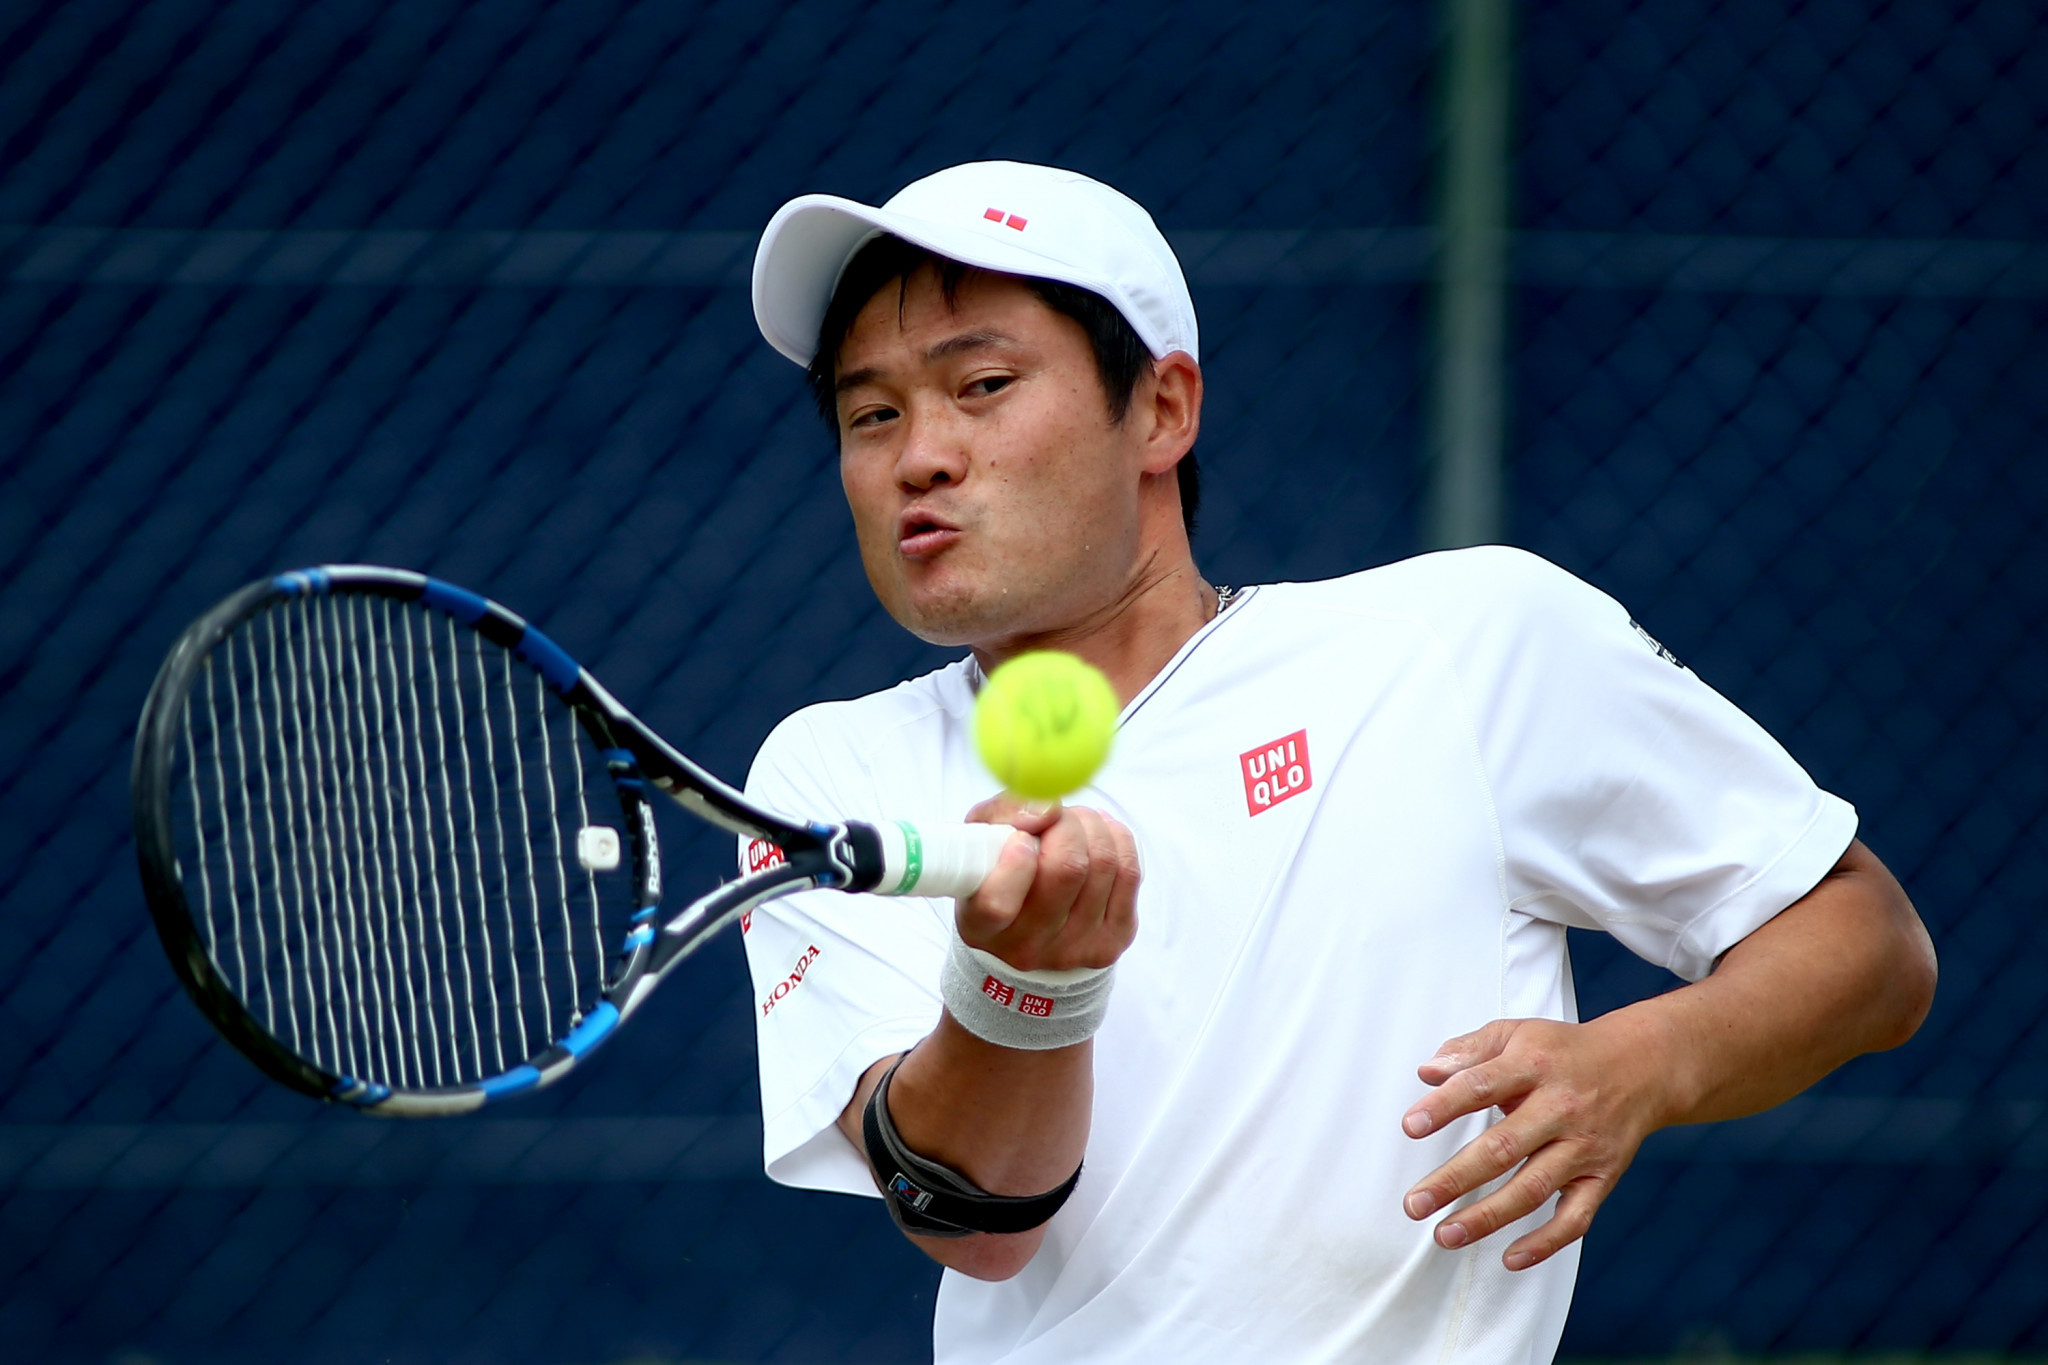 Shingo Kuneida of Japan enjoyed a tough victory ©Getty Images